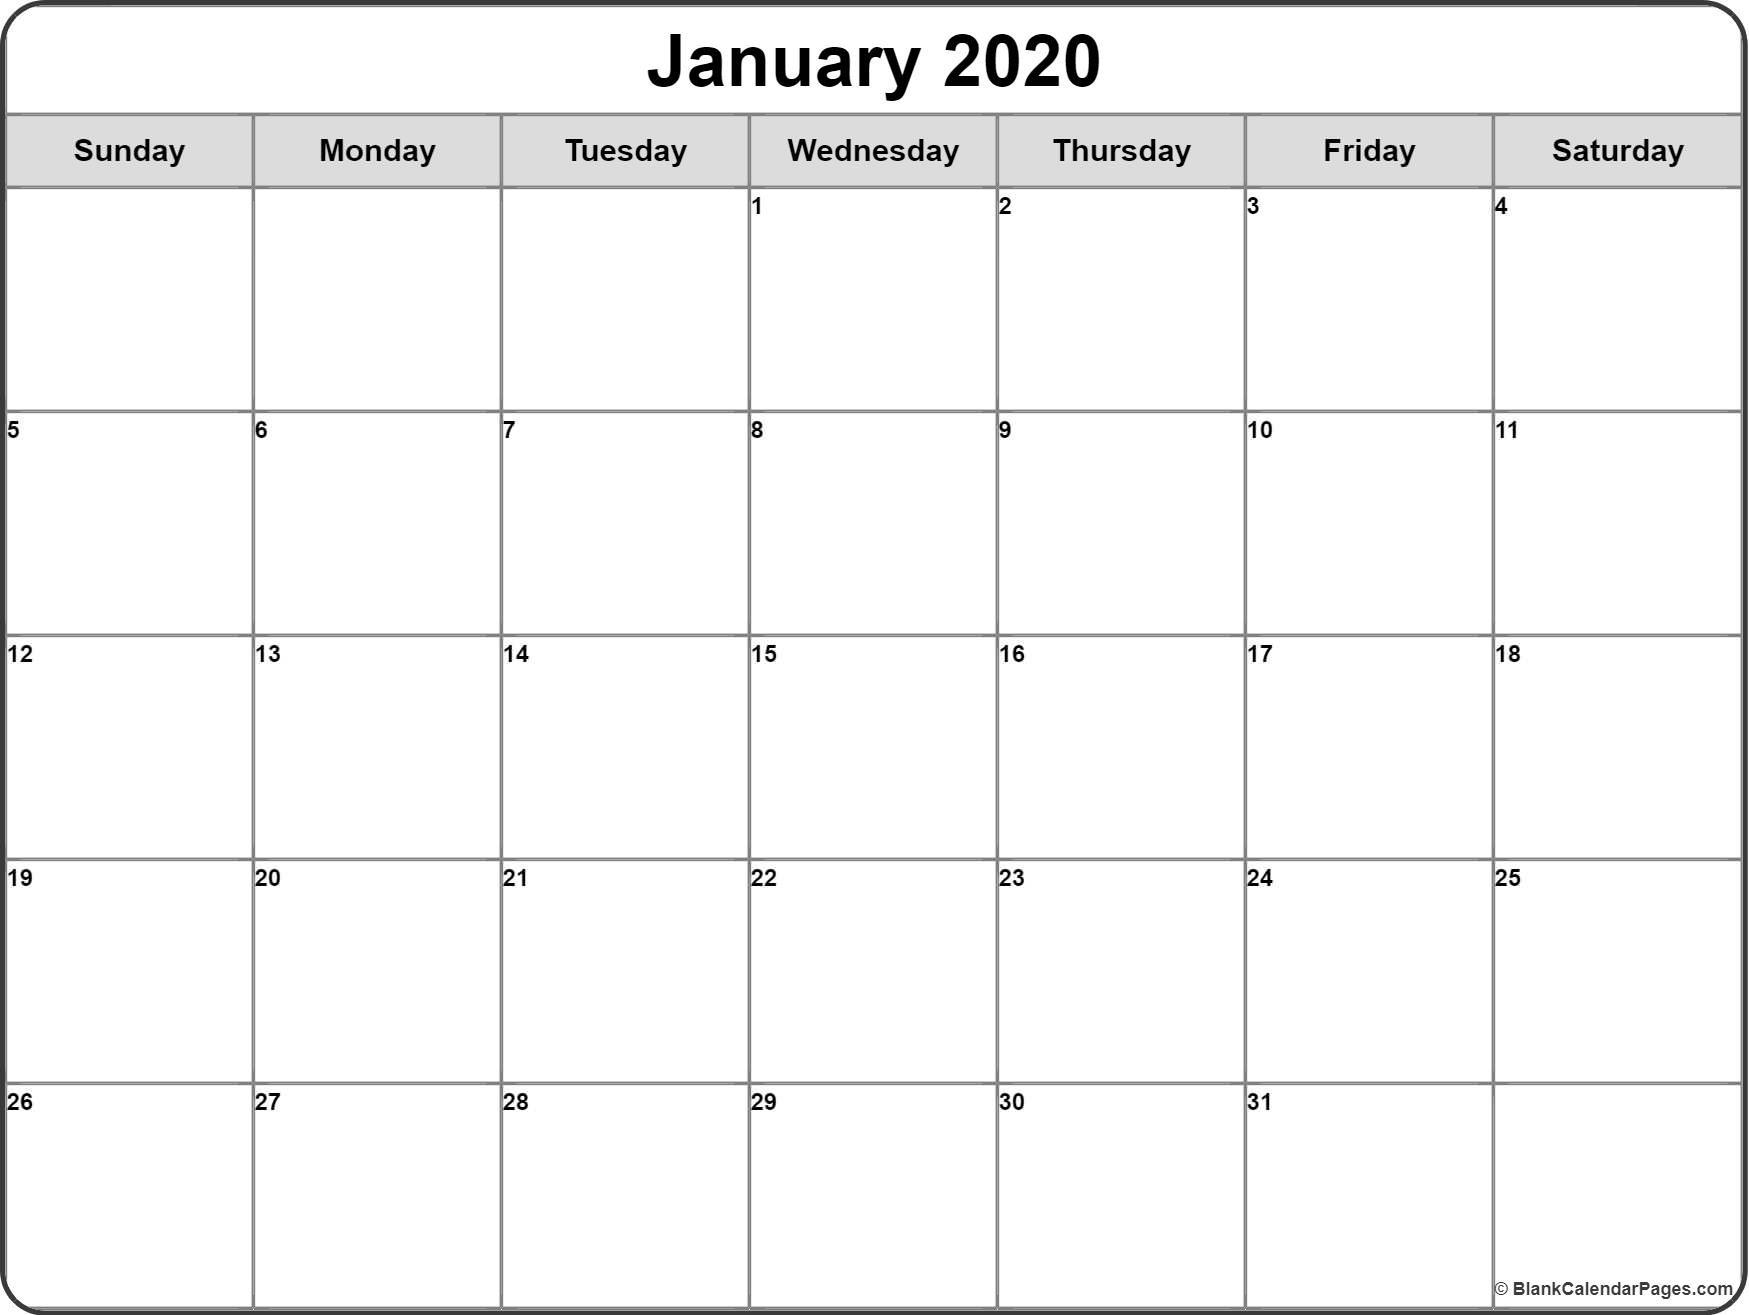 January 2020 Calendar | Free Printable Monthly Calendars-2020 Printable Calendar Templates Free